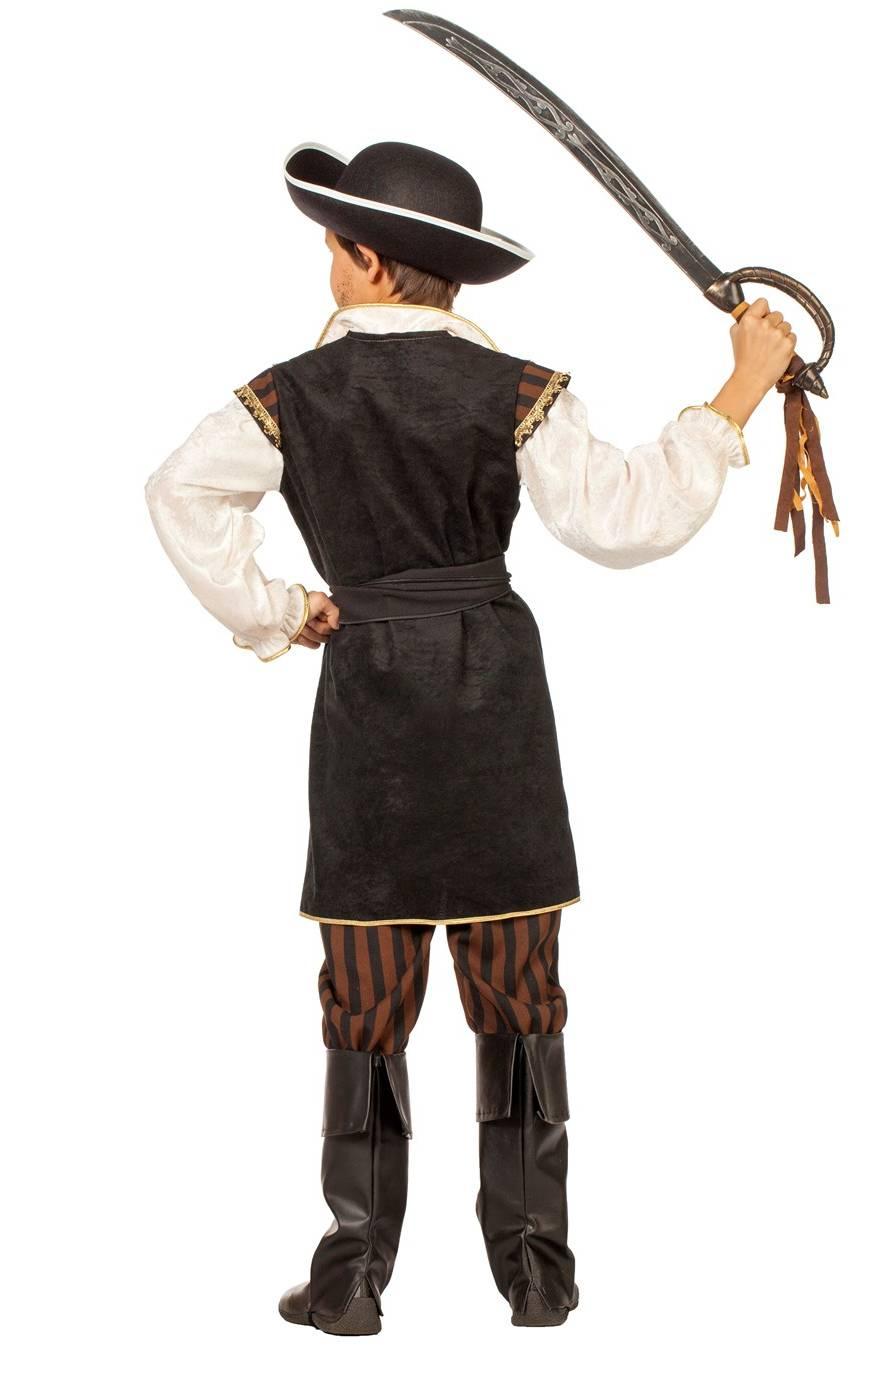 Costume-de-pirate-pour-garçon-2